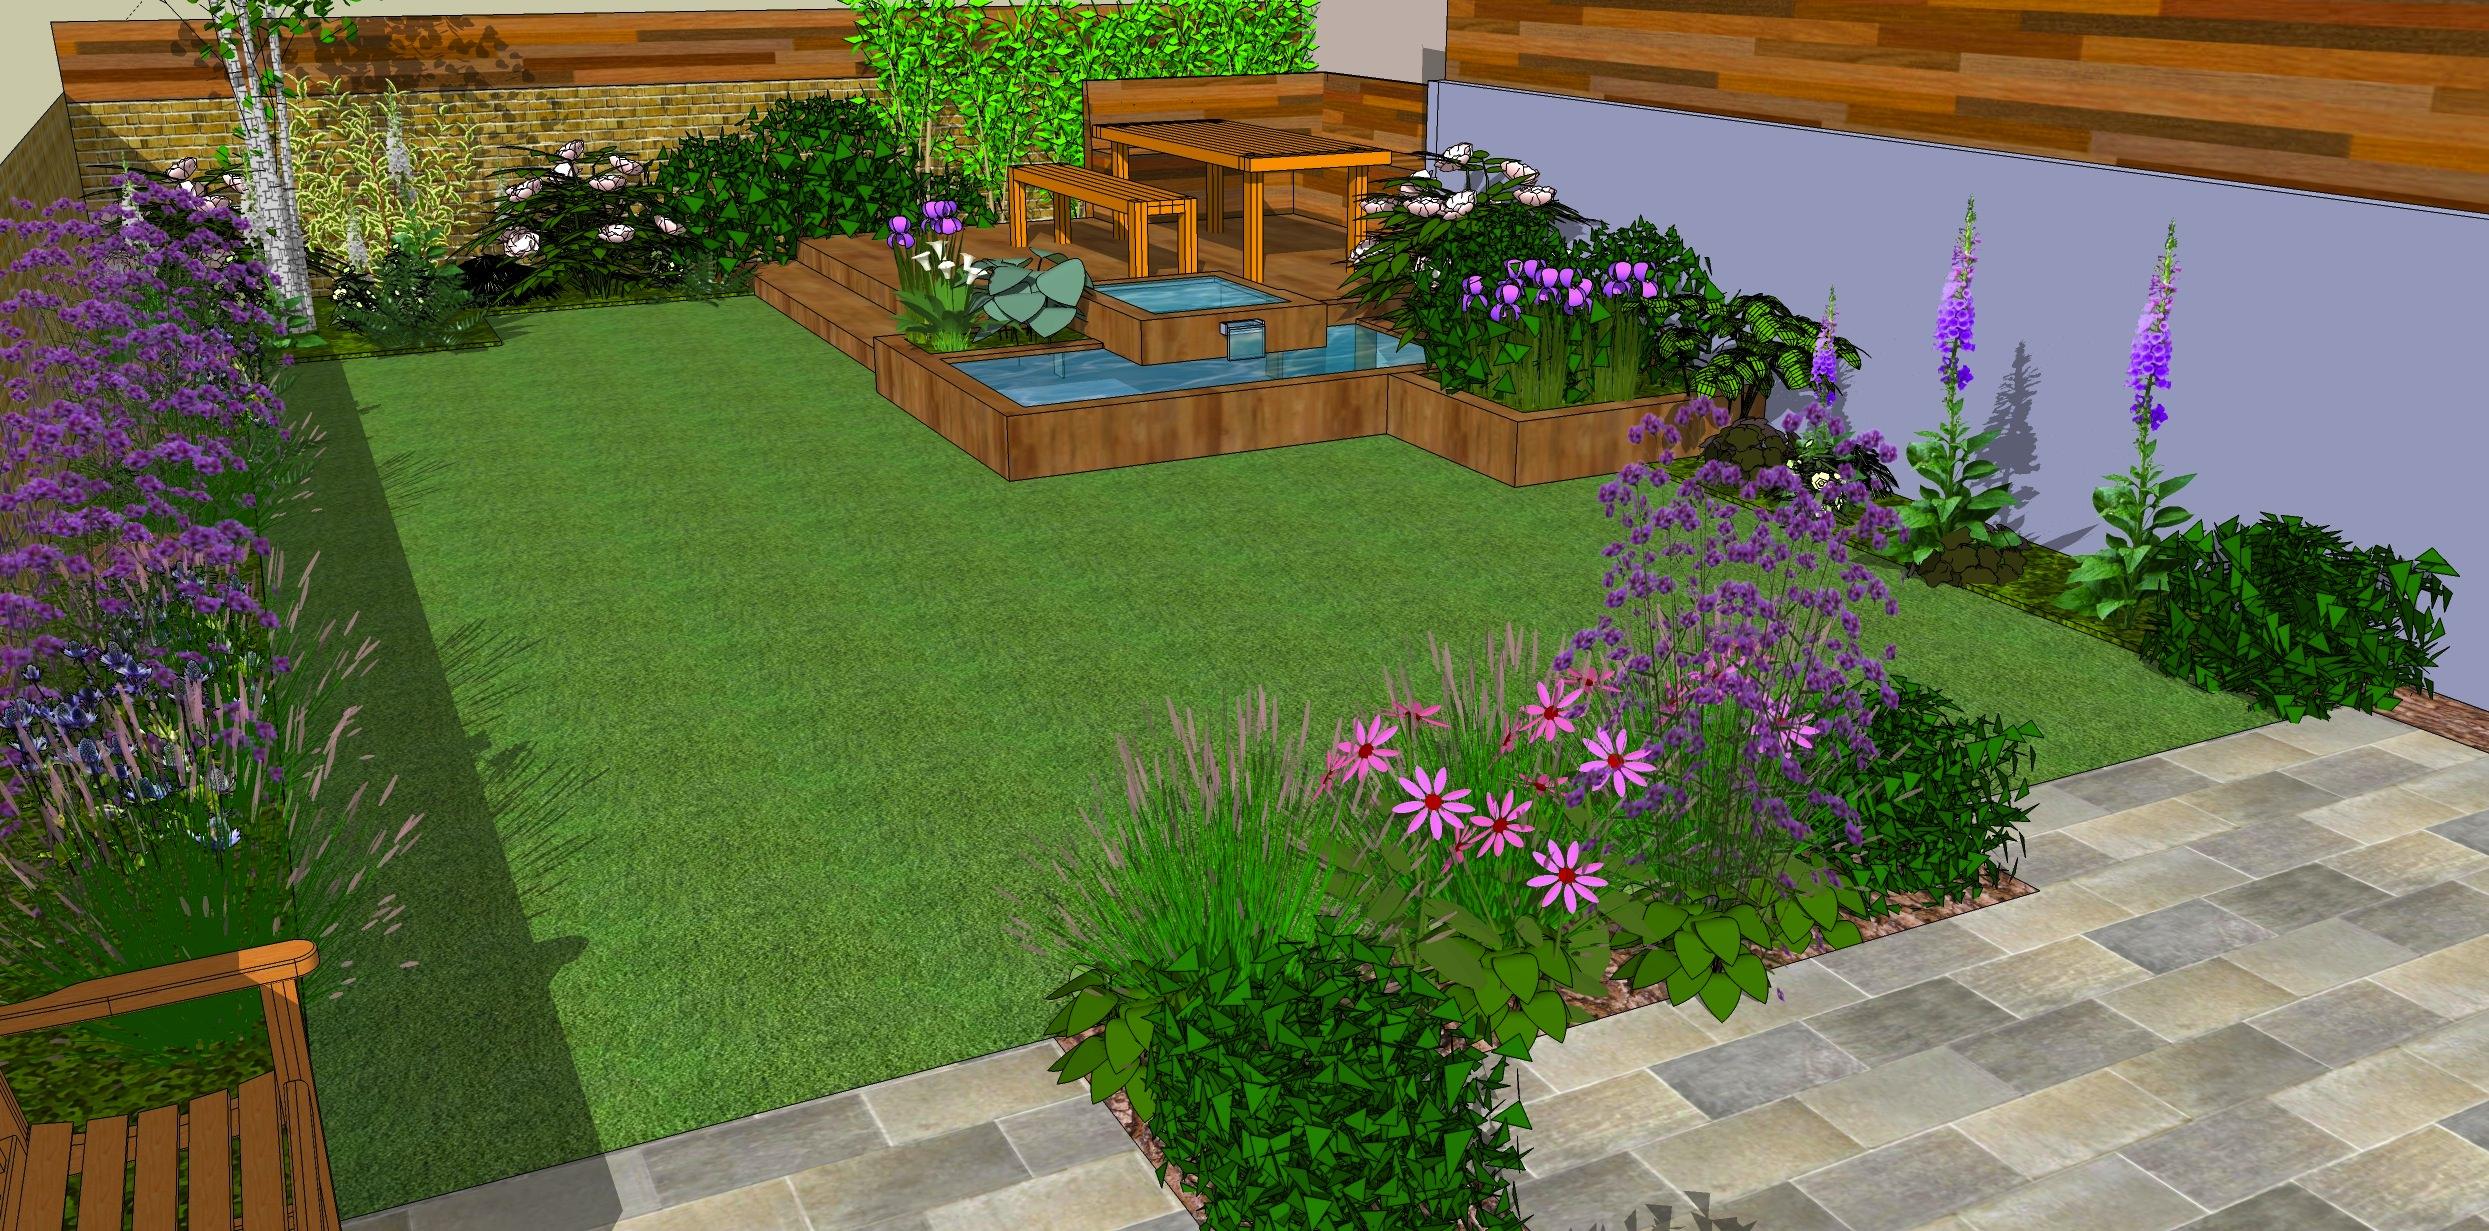 Low Maintenance garden designs - Garden Club London on Low Maintenance Backyard Design  id=70216